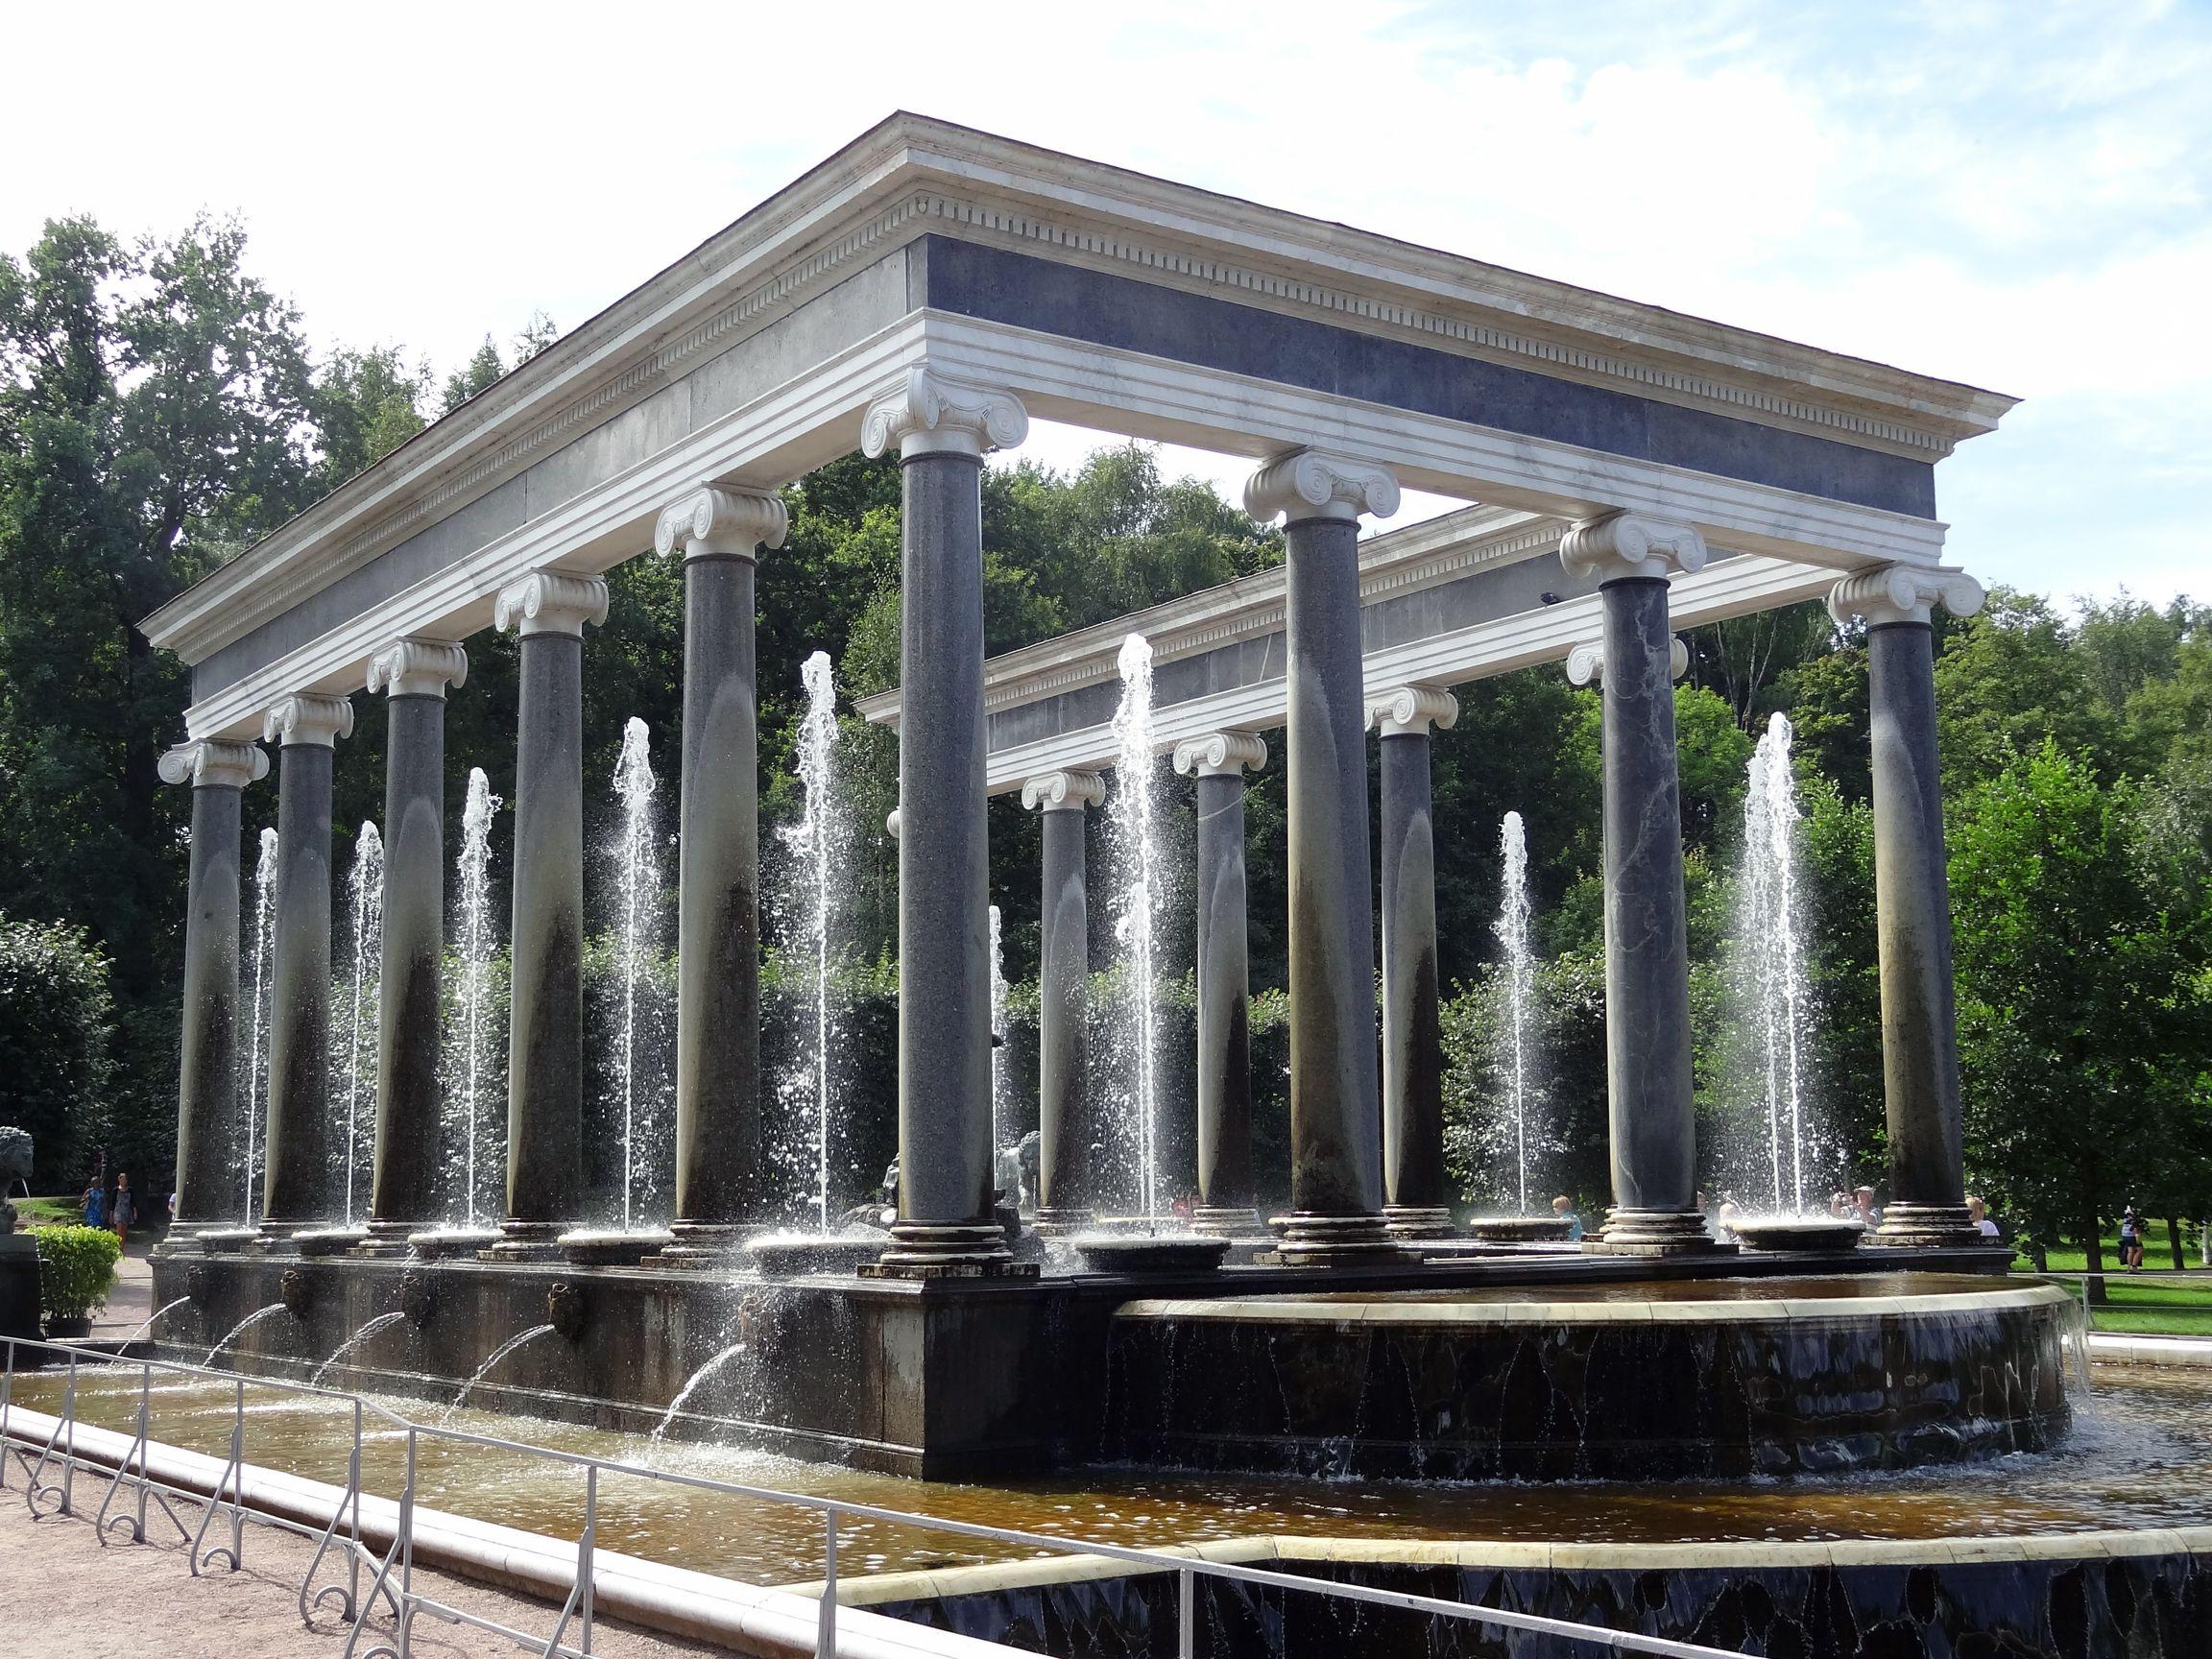 Griechischer Brunnen